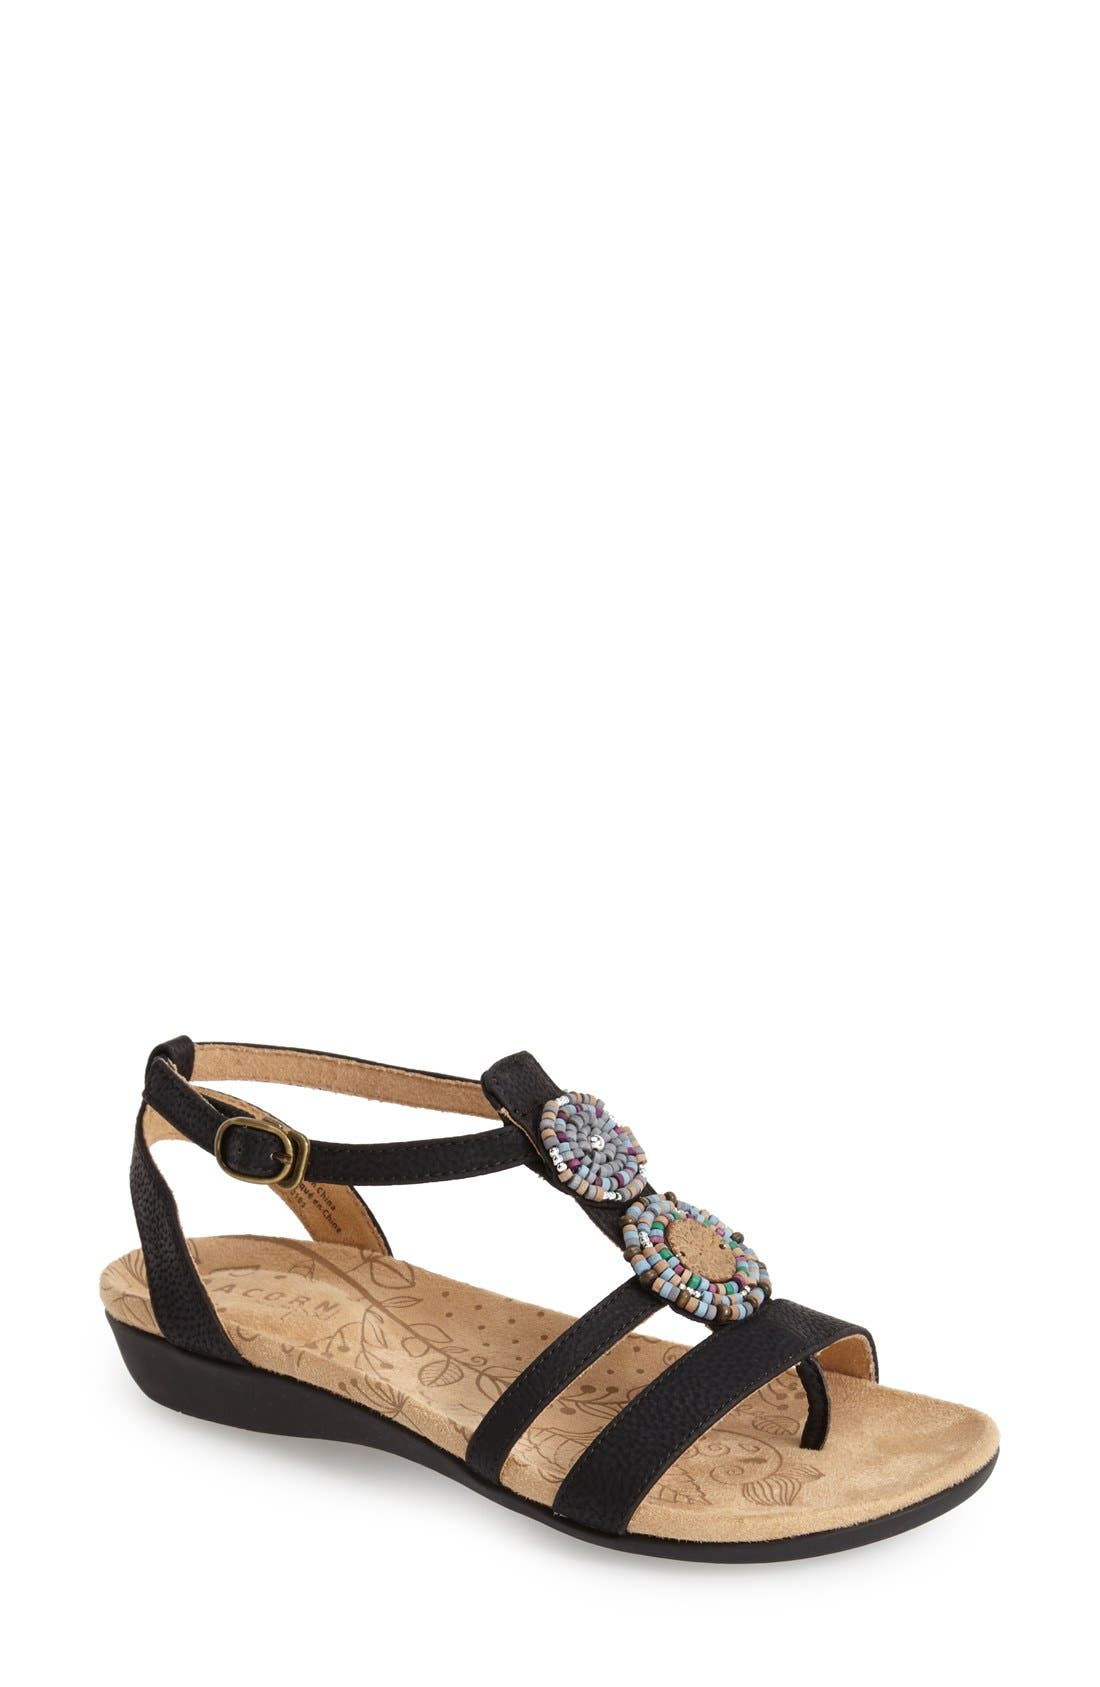 Main Image - Acorn Ankle Strap Sandal (Women)